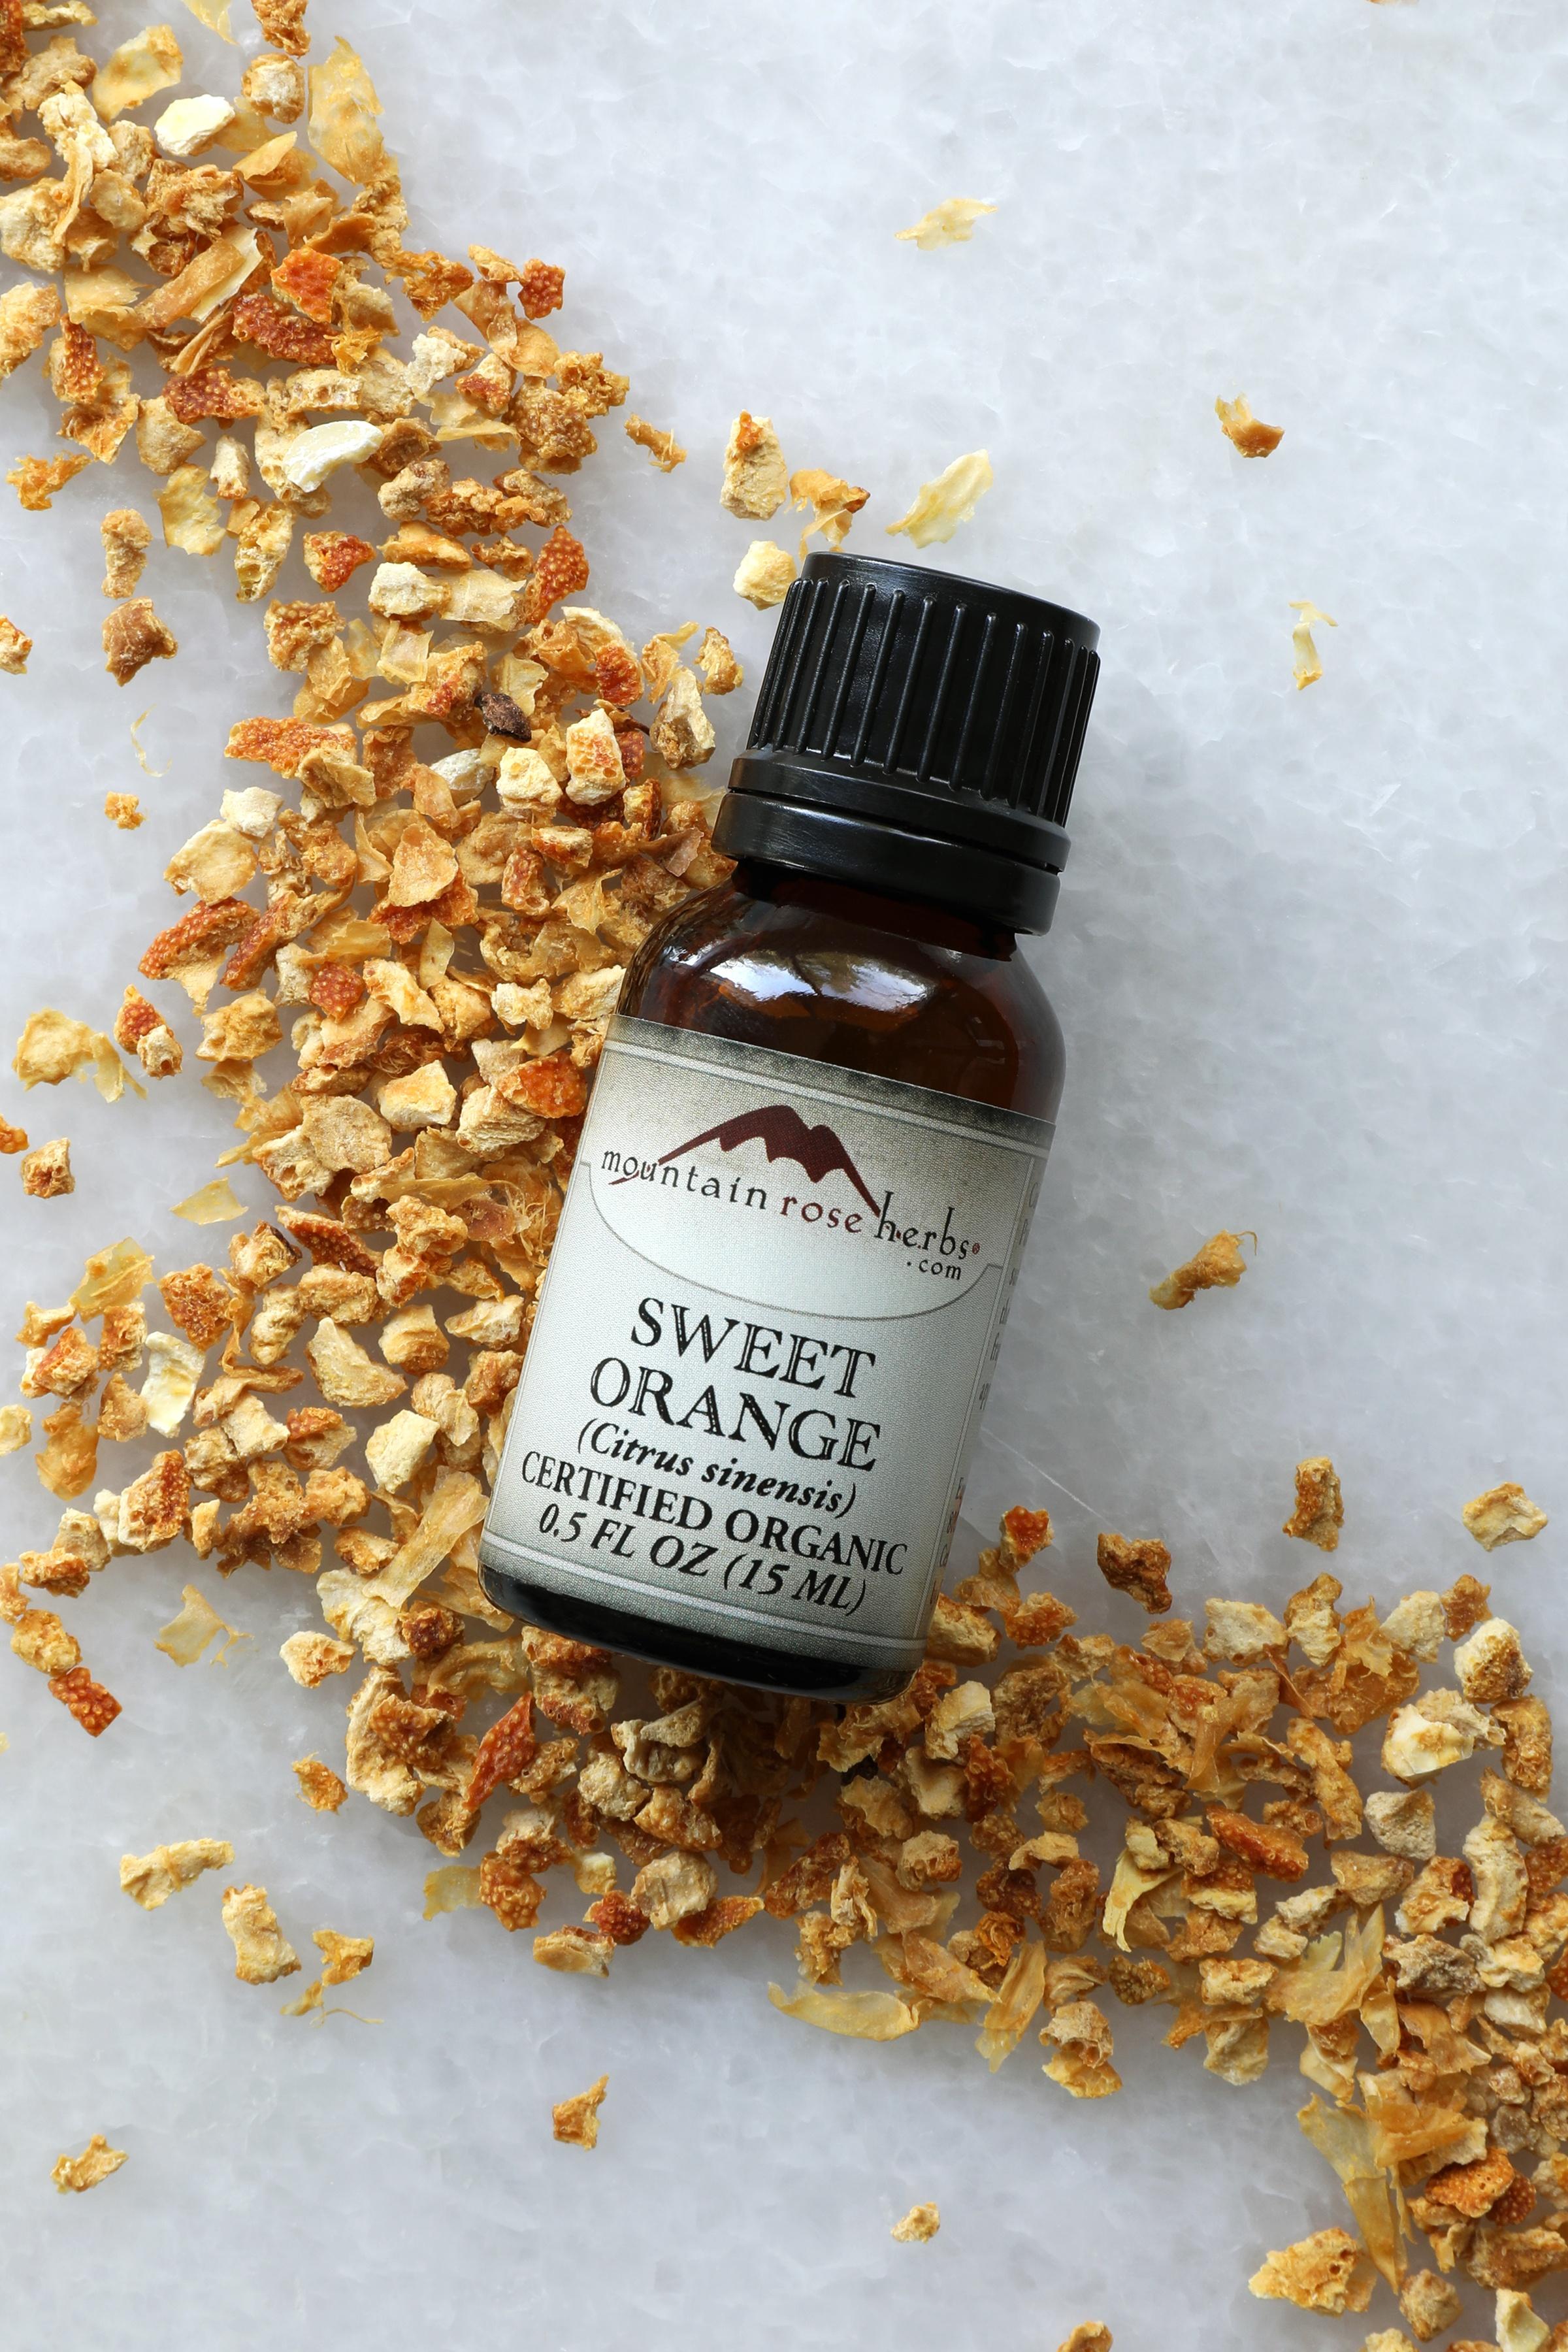 1/2 oz bottle of Mountain Rose Herbs sweet orange essential oil on dried orange peel